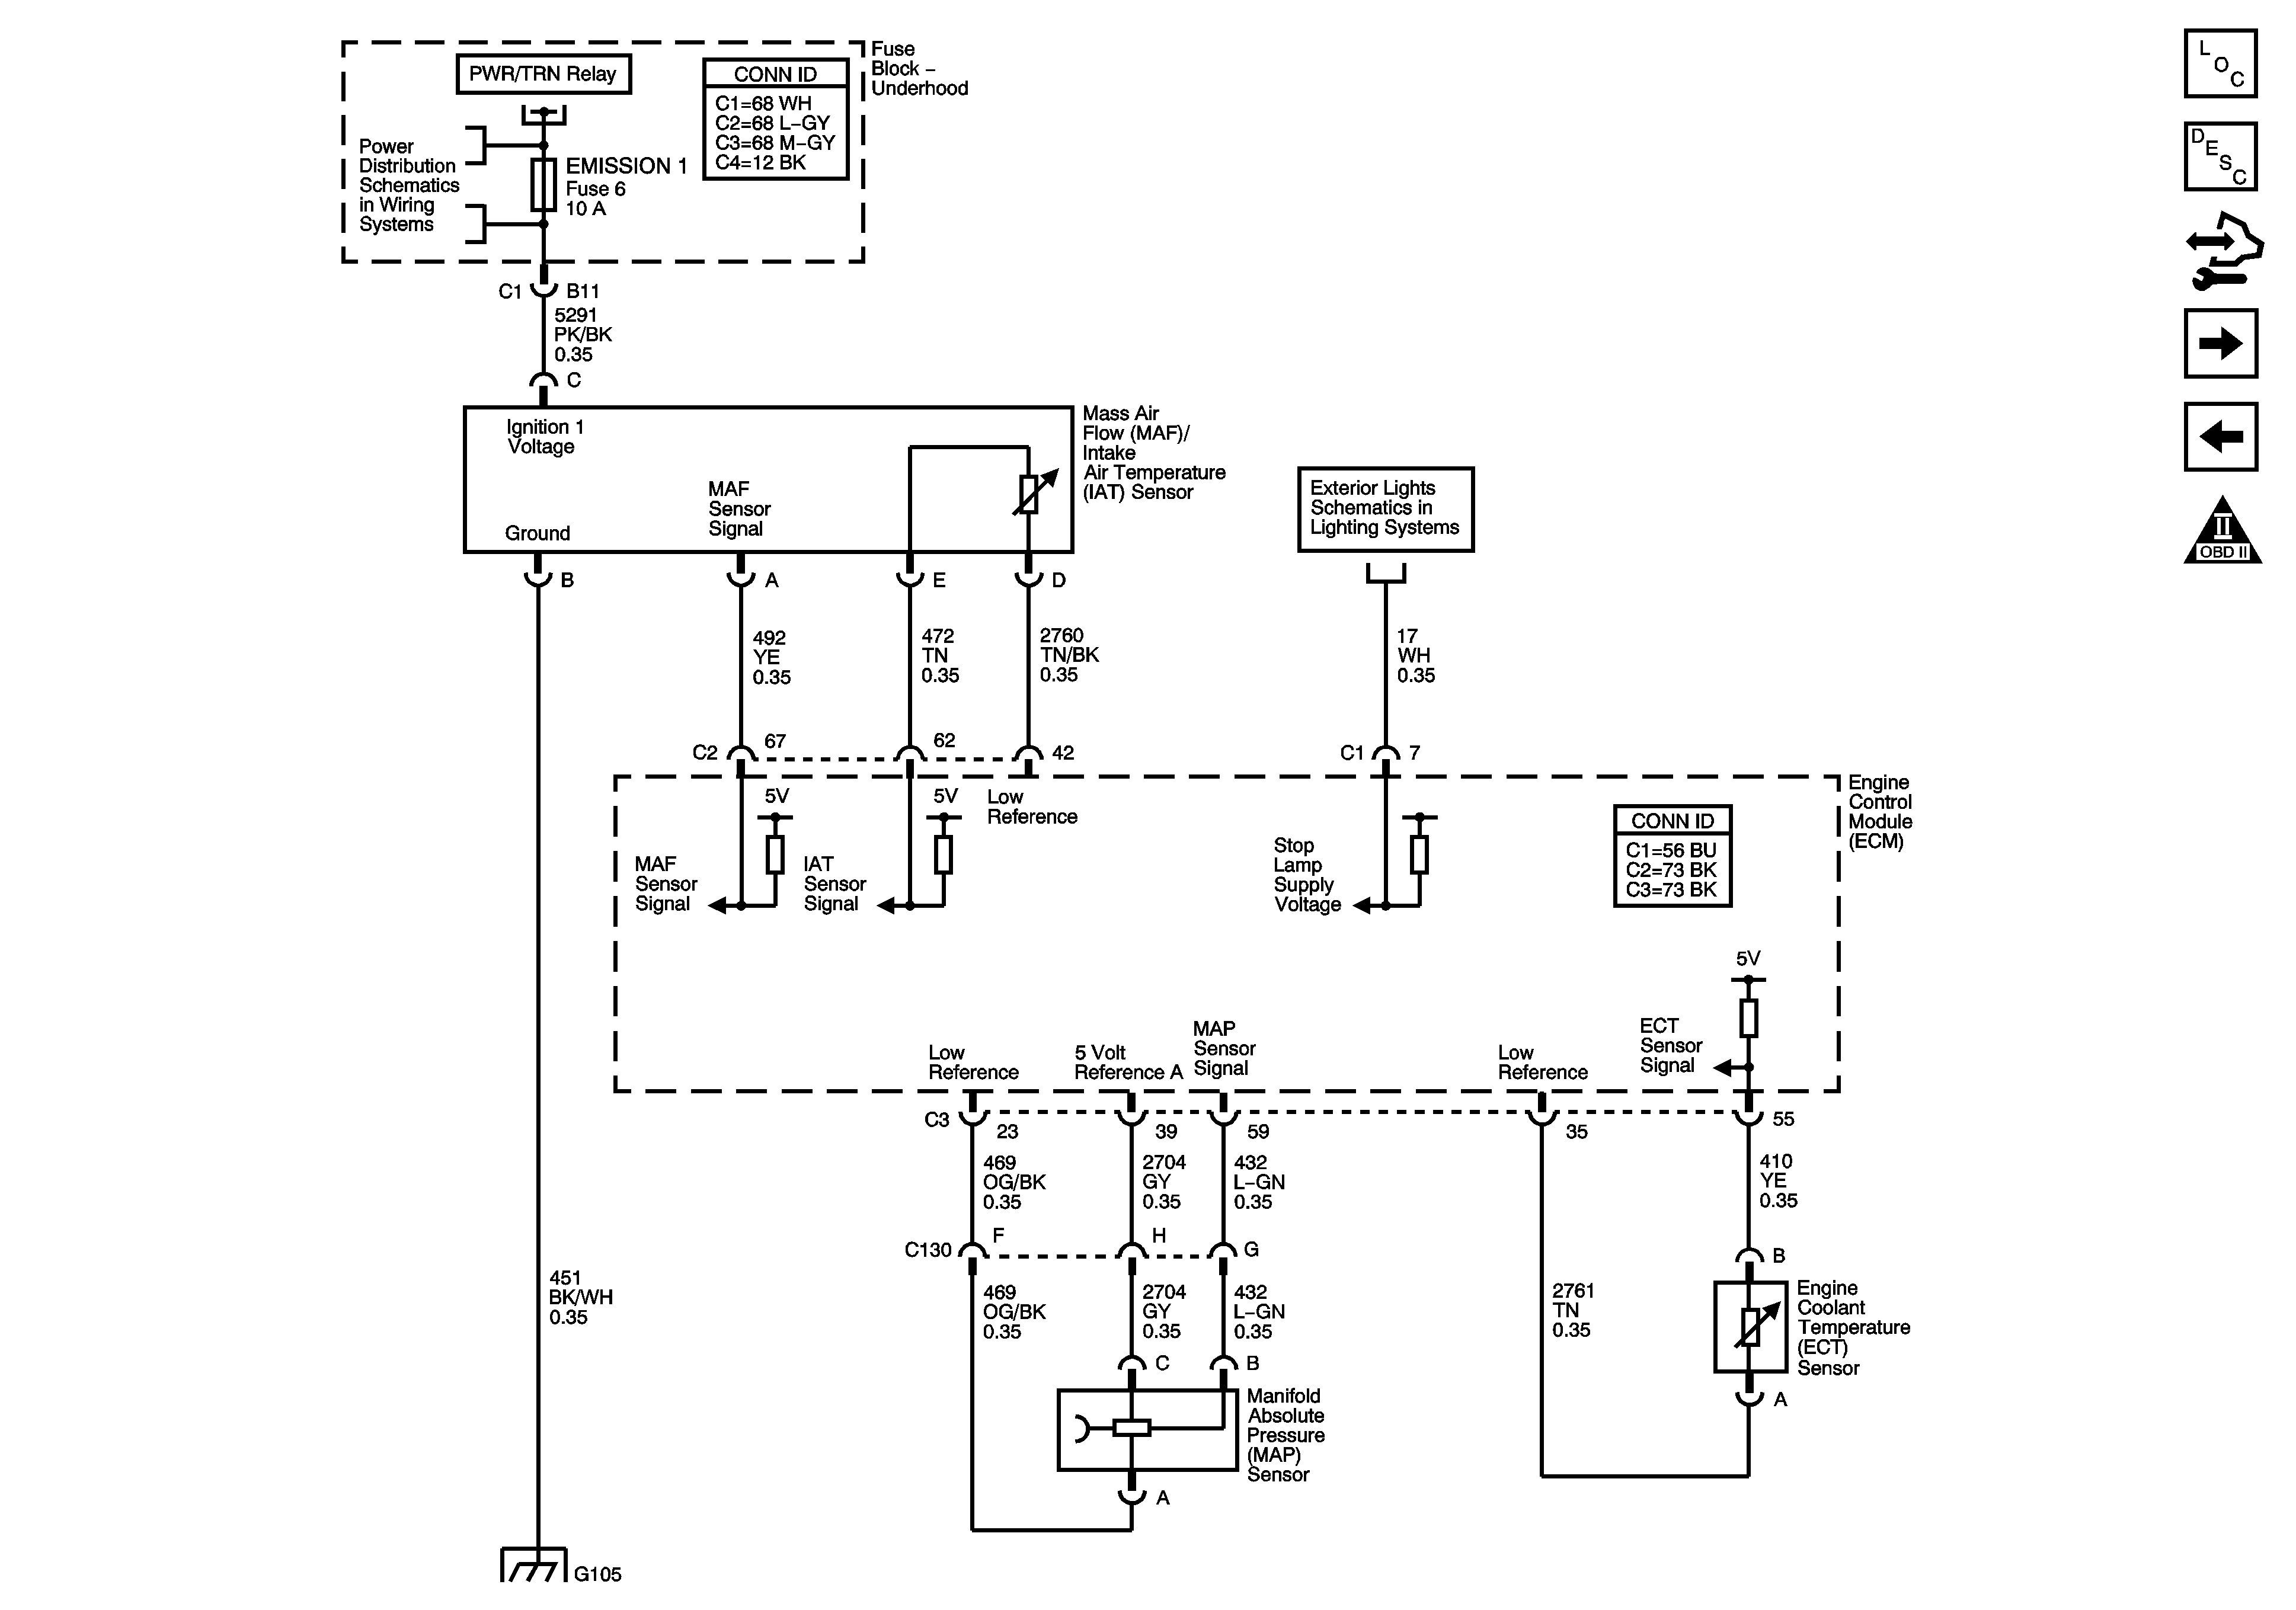 2007 Pontiac G6 Maf Sensor Wiring Diagram - Wiring Diagrams DataUssel